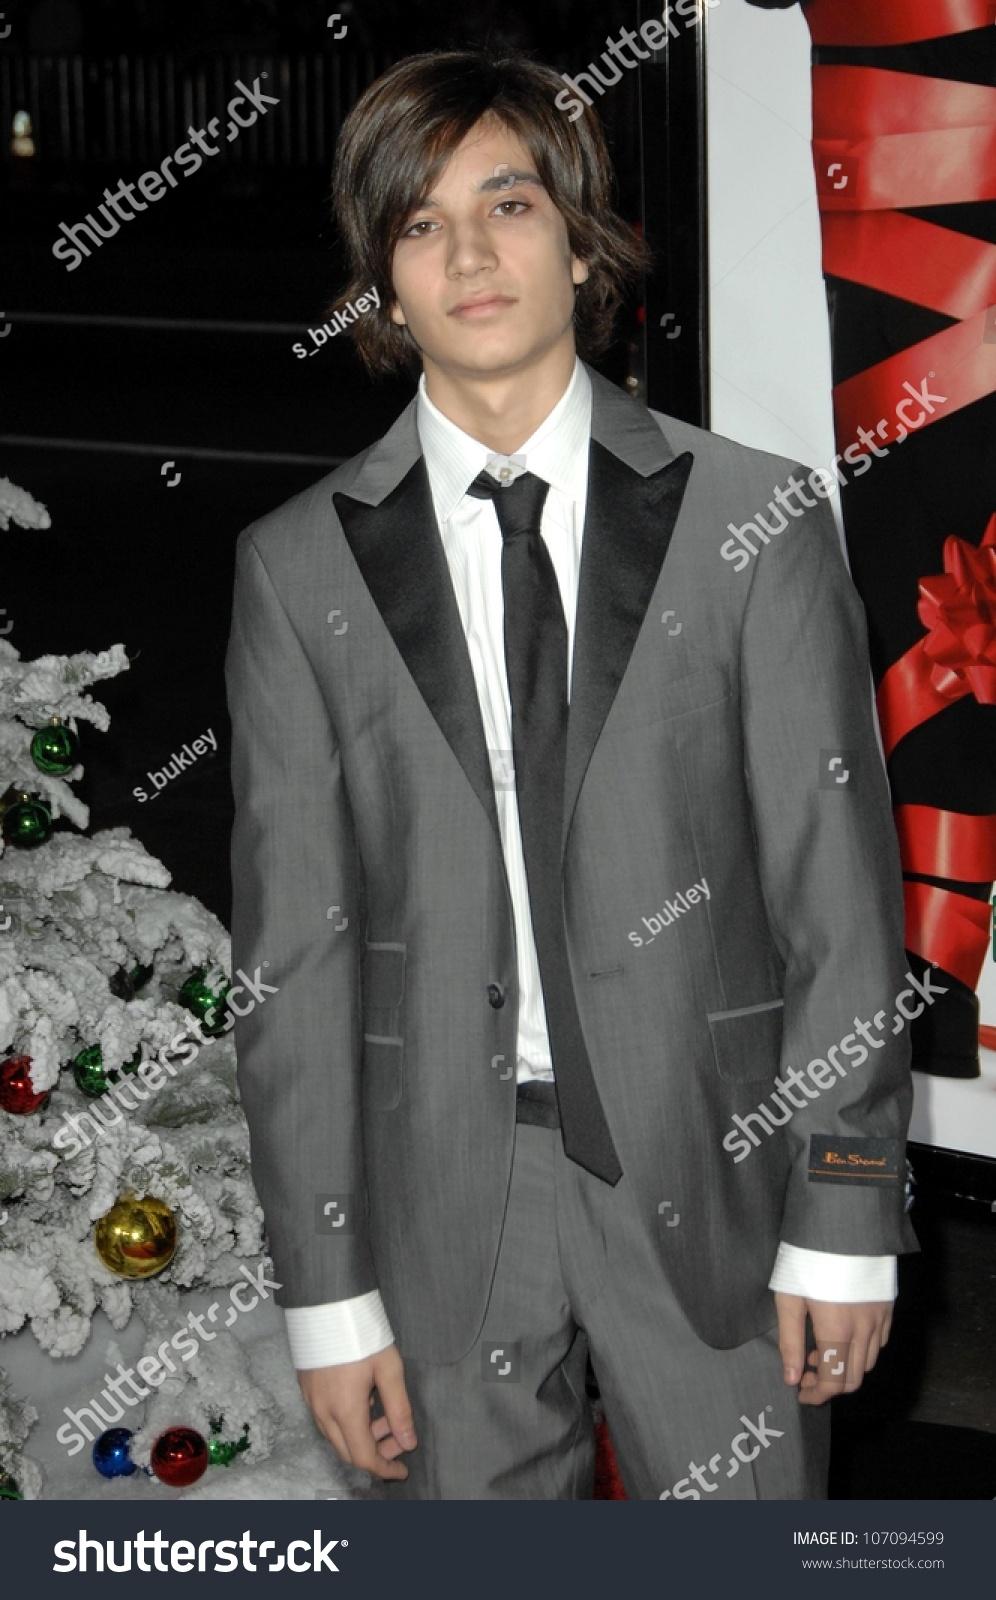 Taylor Boggan World Premiere Four Christmases Stock Photo ... | 996 x 1600 jpeg 392kB